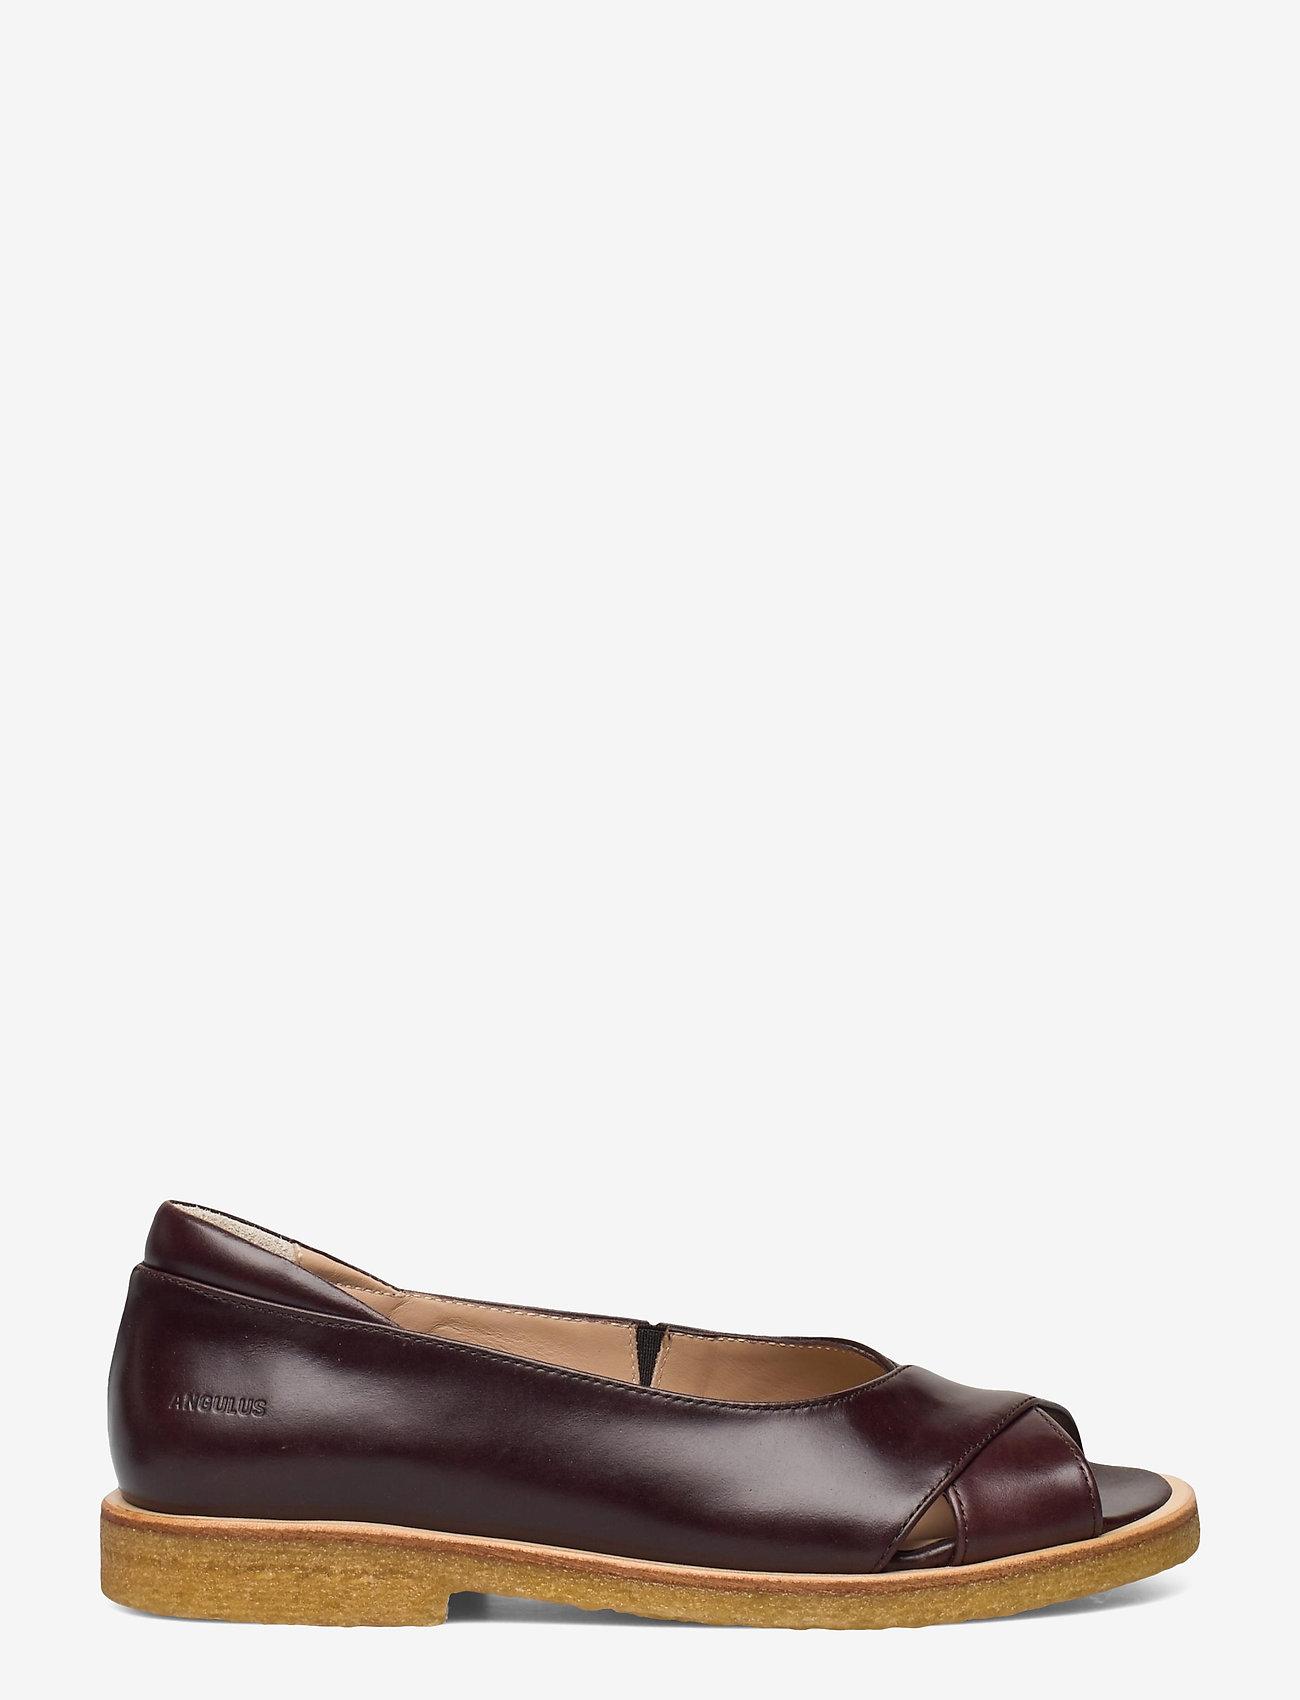 ANGULUS - Sandals - flat - open toe - clo - flache sandalen - 1836/002 dark brown/dark brown - 1